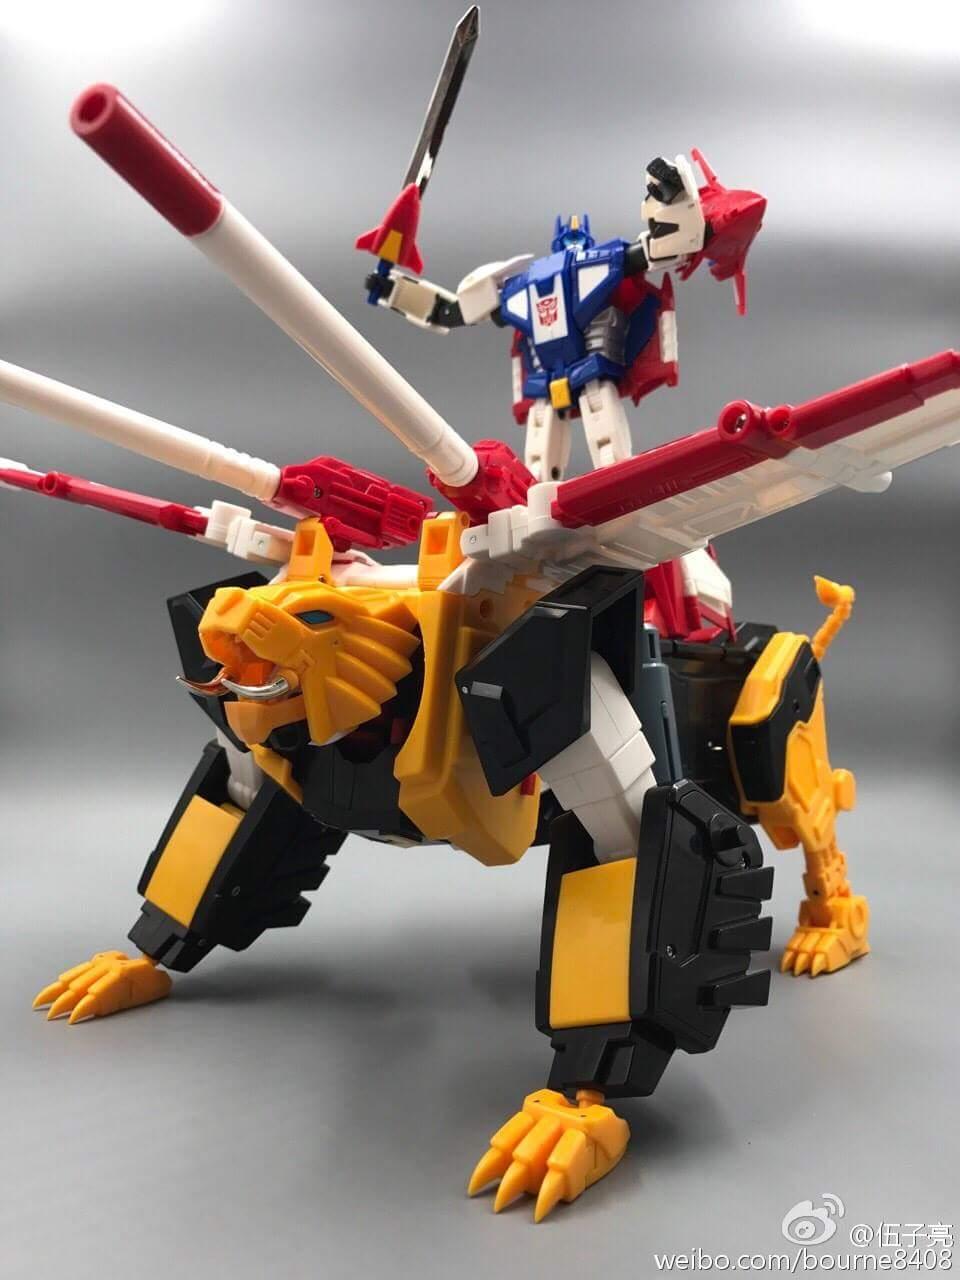 [KFC Toys] Produit Tiers - Jouet Phase 8-A Simba - aka Victory Leo (Transformers Victory) - Page 2 OGeAYteI